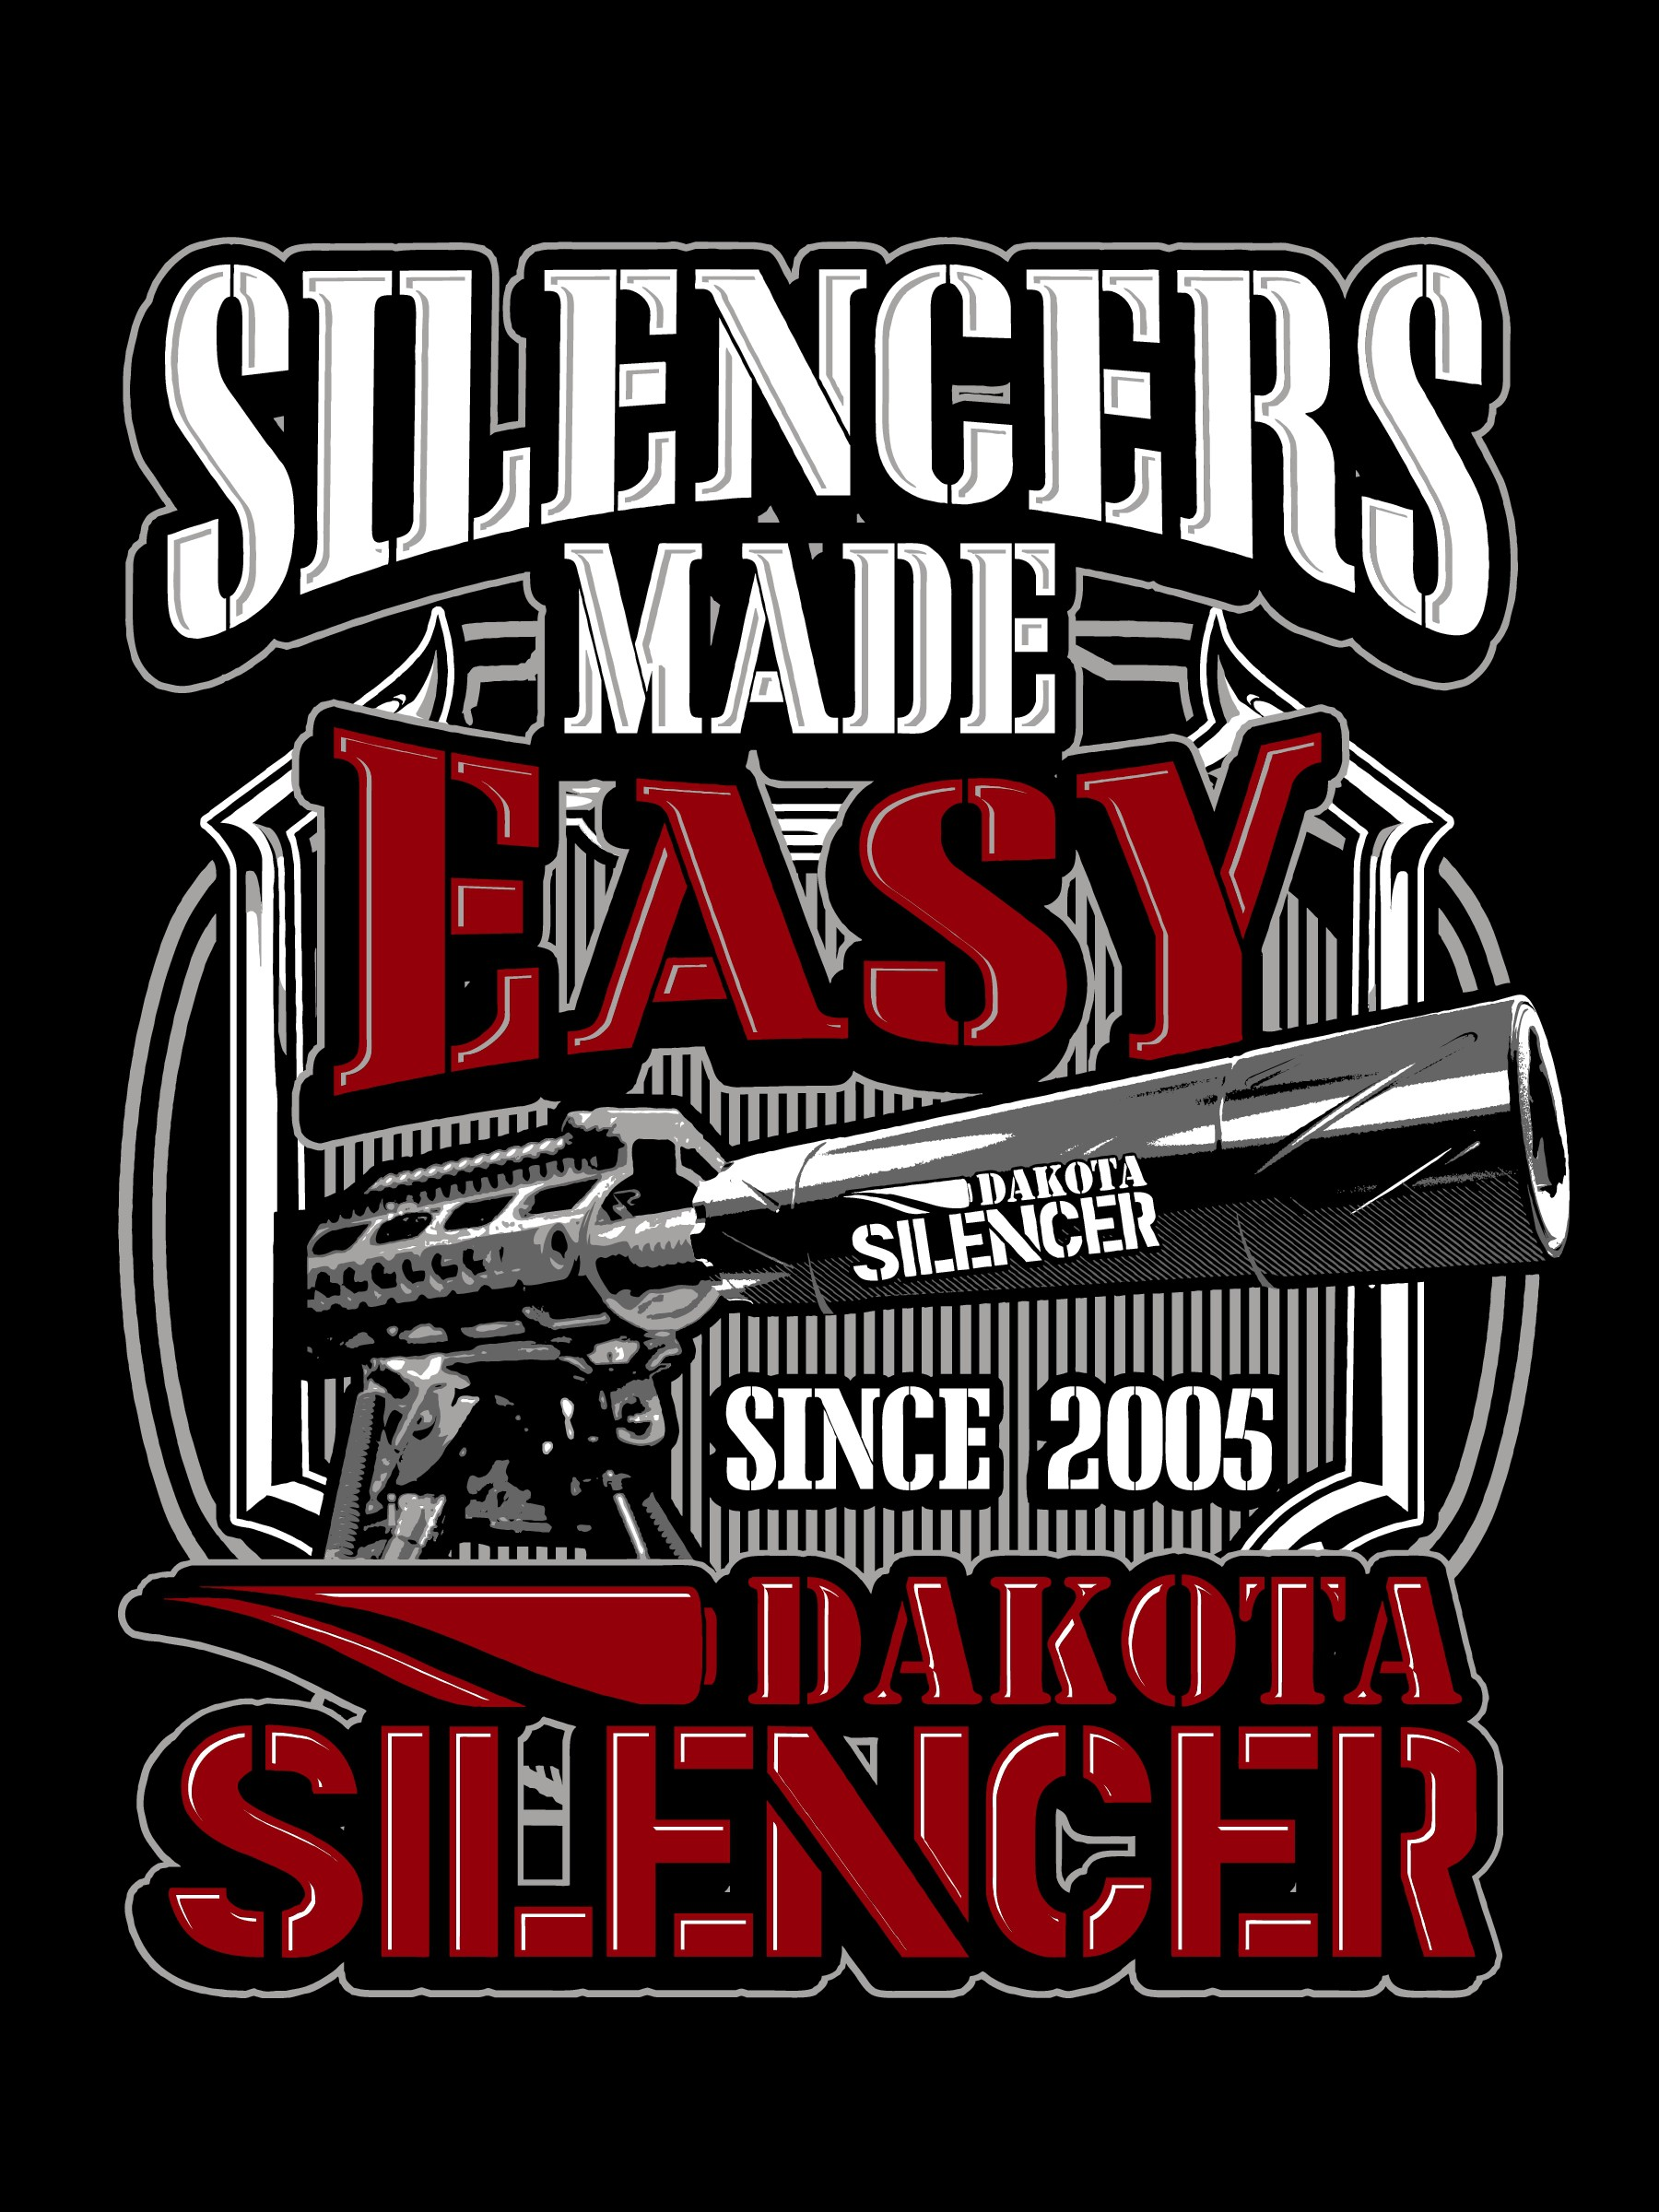 Create Simple t-shirt design for Dakota Silencer (Tactical, Masculine)